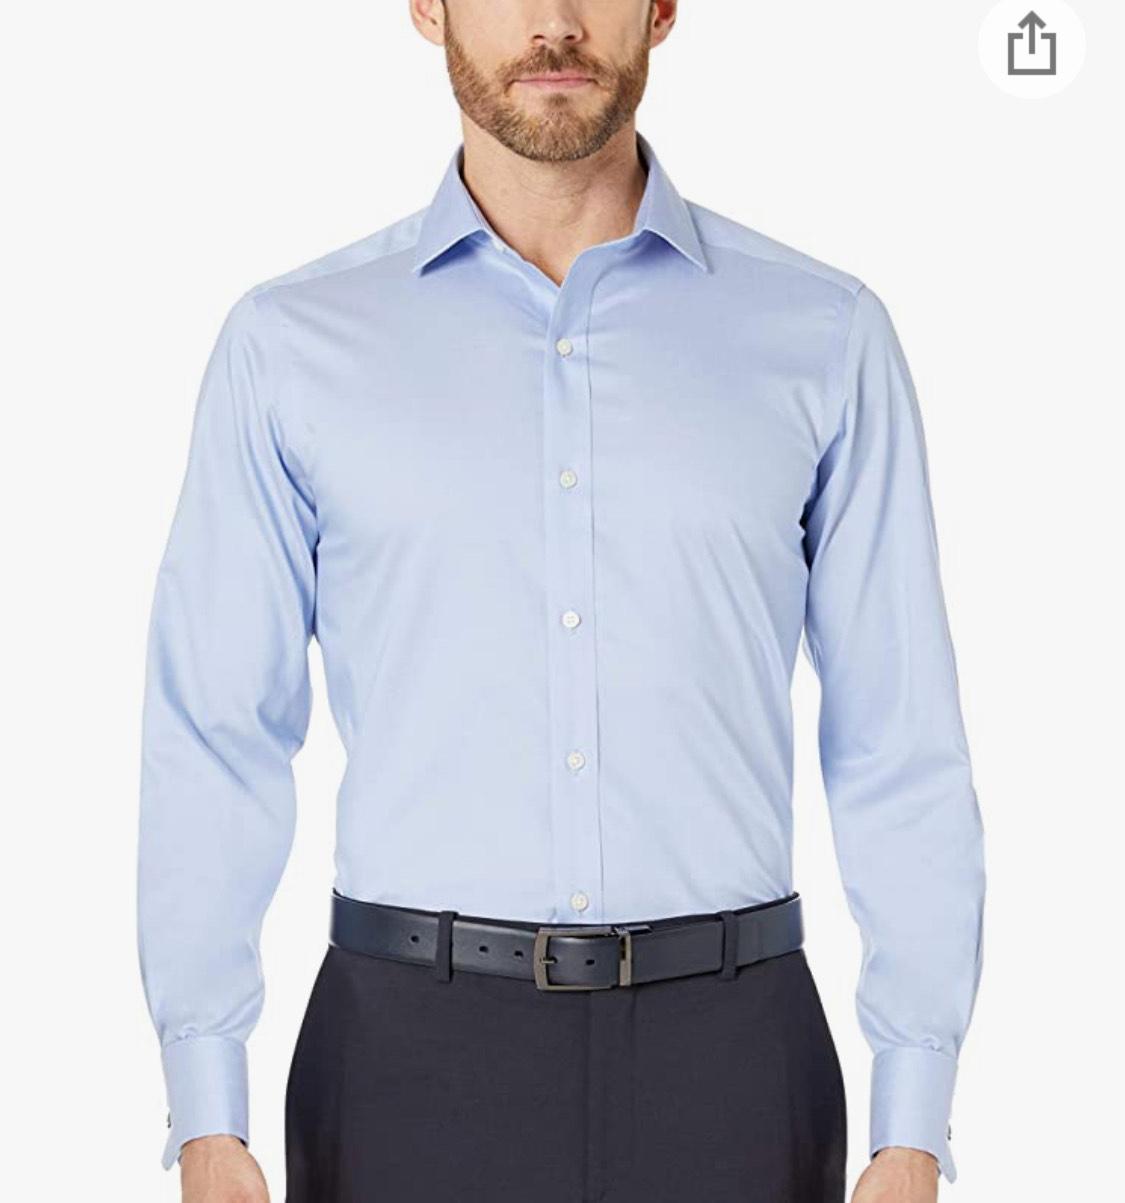 Camisa algodón azul claro talla XL (43cm. cuello/91cm. manga)